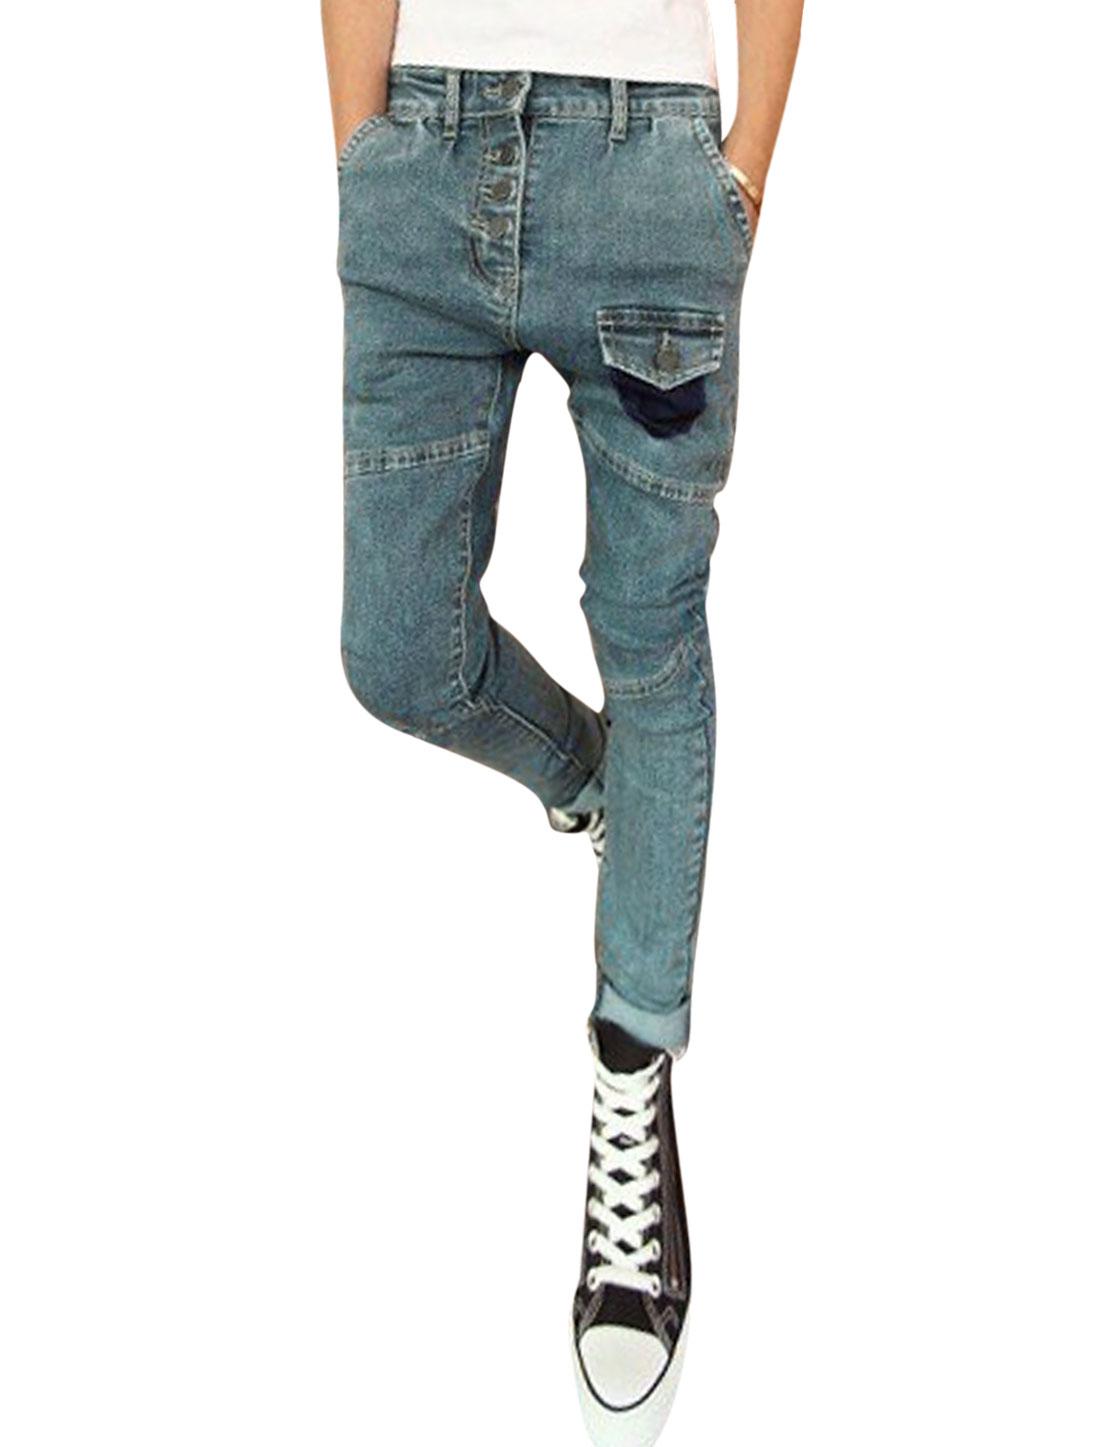 Men Mock Pocket Front Four-Button Closure Jeans Light Cool Gray W30